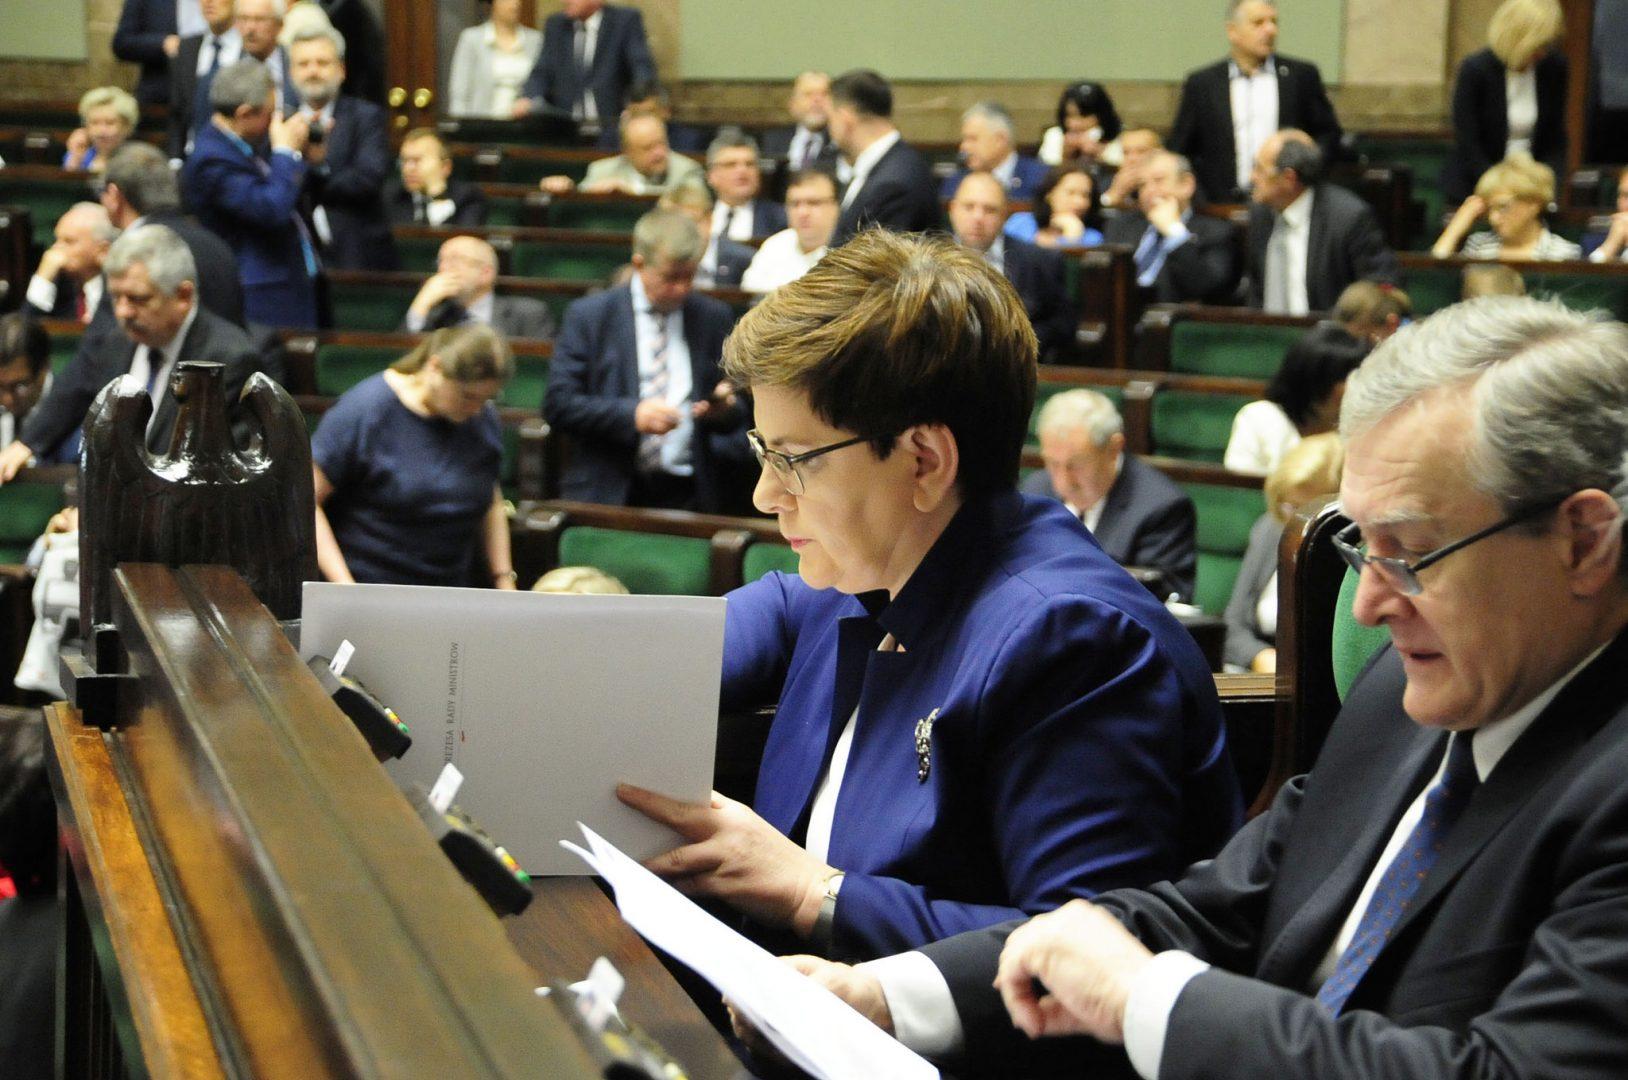 Beata Szydło/Fot. KPRM/Domena publiczna/Flickr